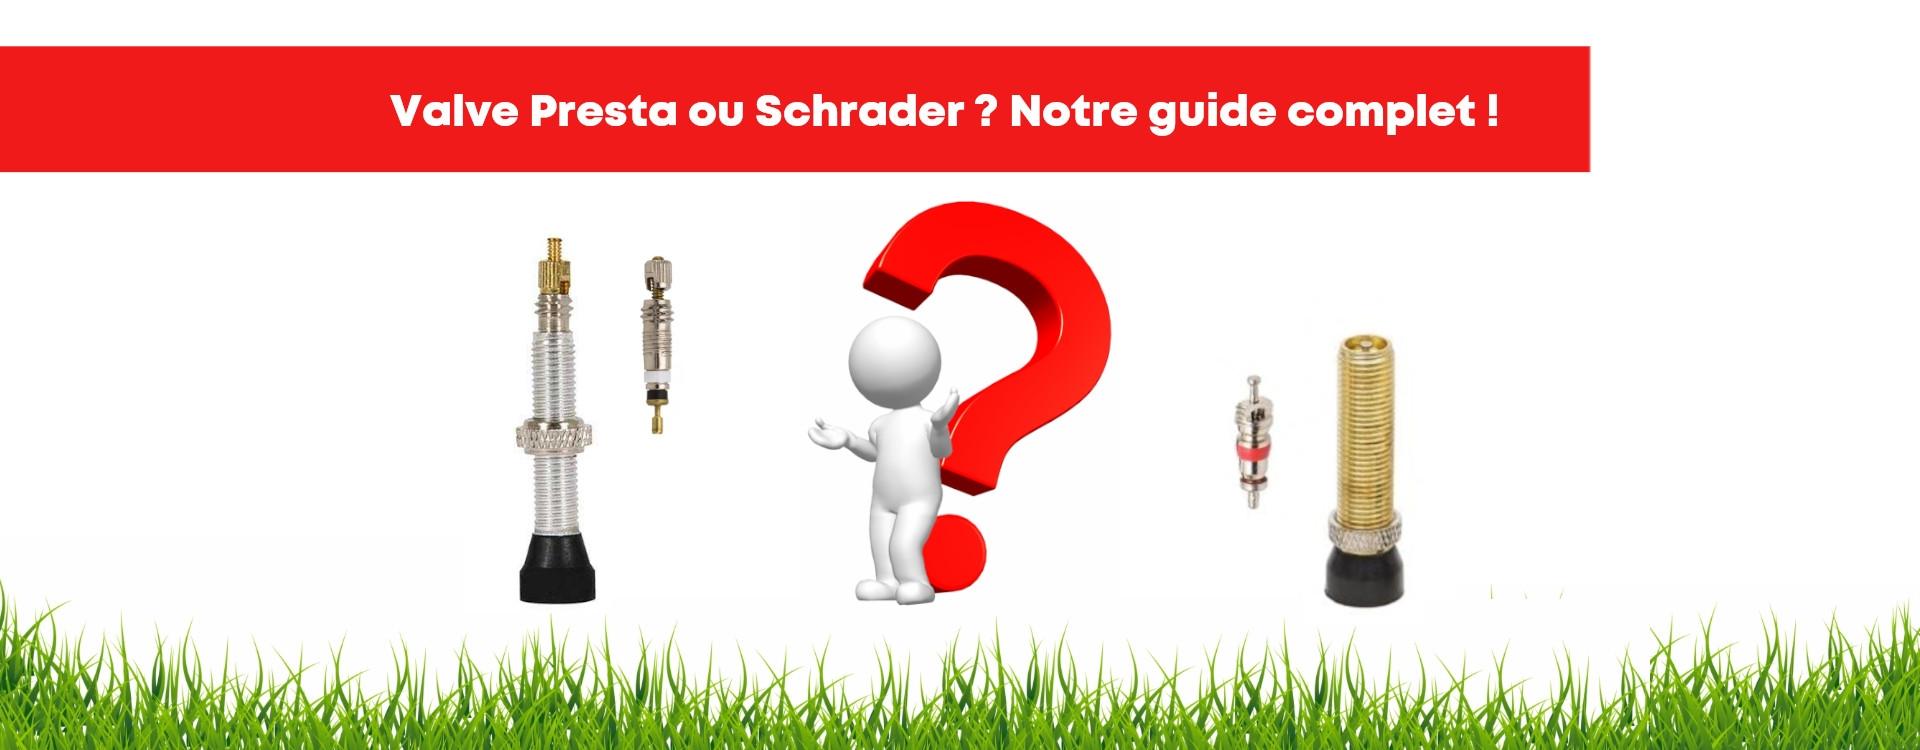 Valve Presta ou Schrader - Notre guide !